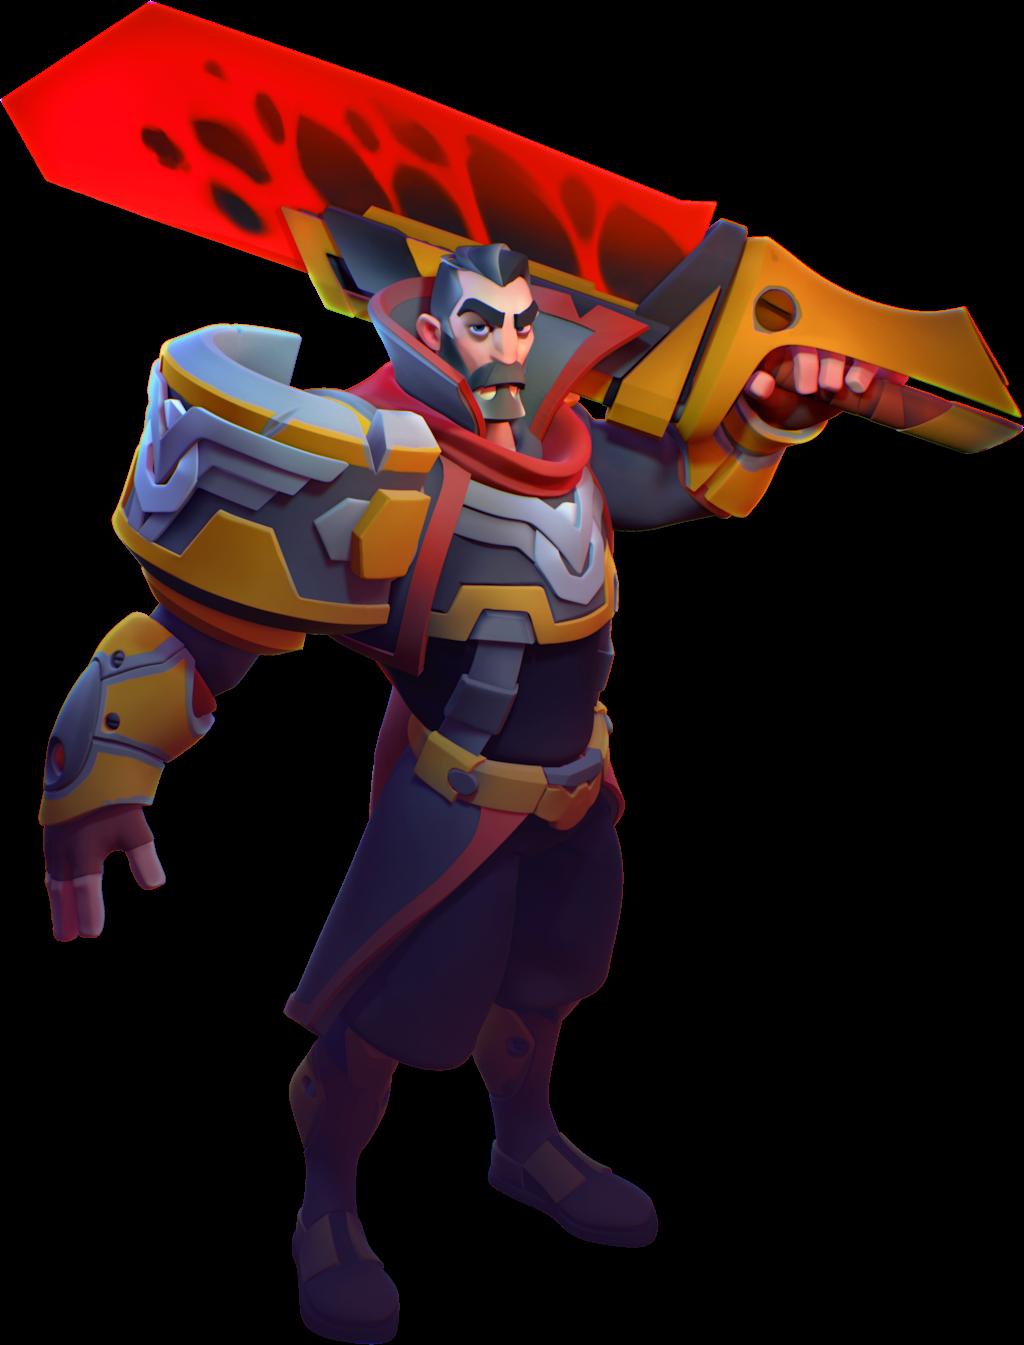 Warriors planet of heroes. Warrior clipart enemy warrior